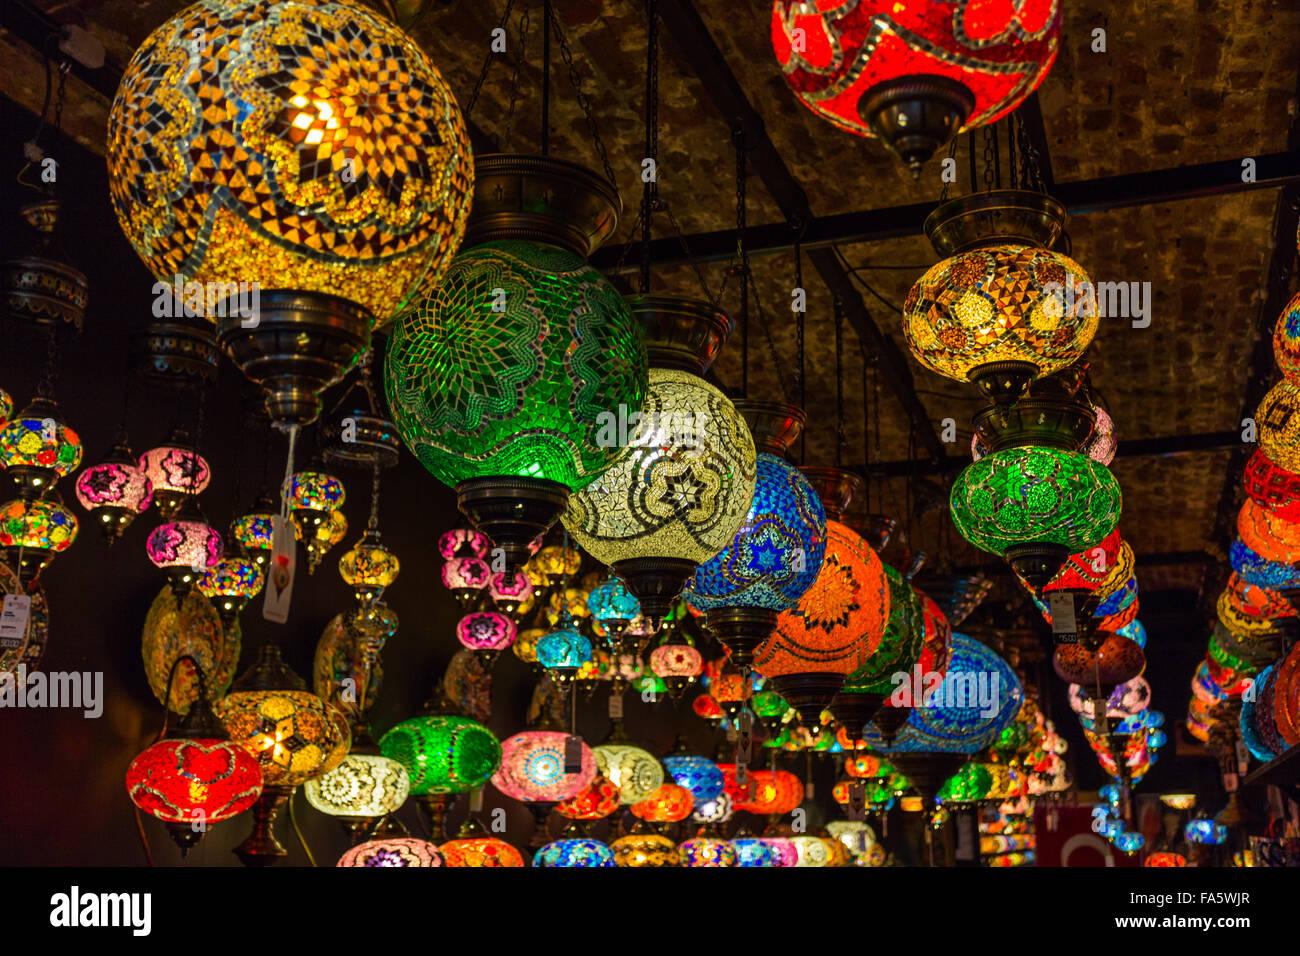 Turkish Lamps In Camden Market, Camden Town, London Borough Of Camden,  London,